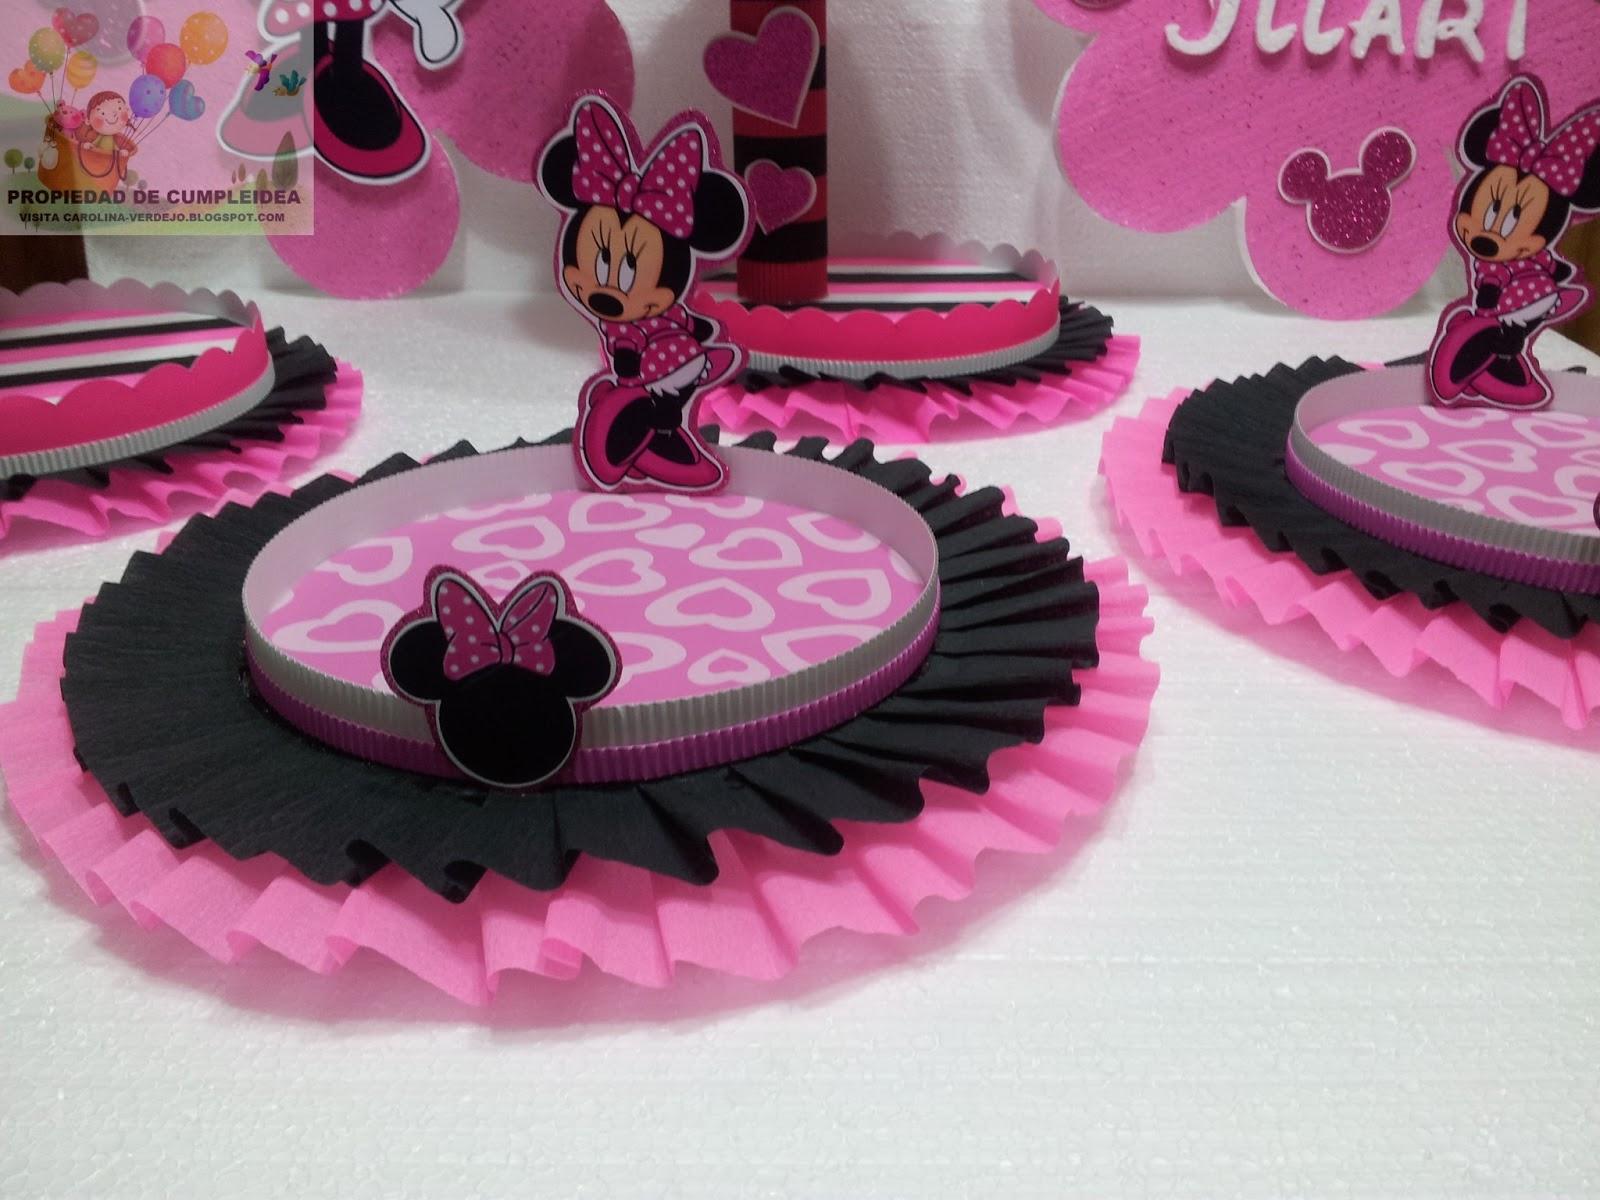 Decoraciones infantiles minnie mouse - Adornos fiesta de cumpleanos ...